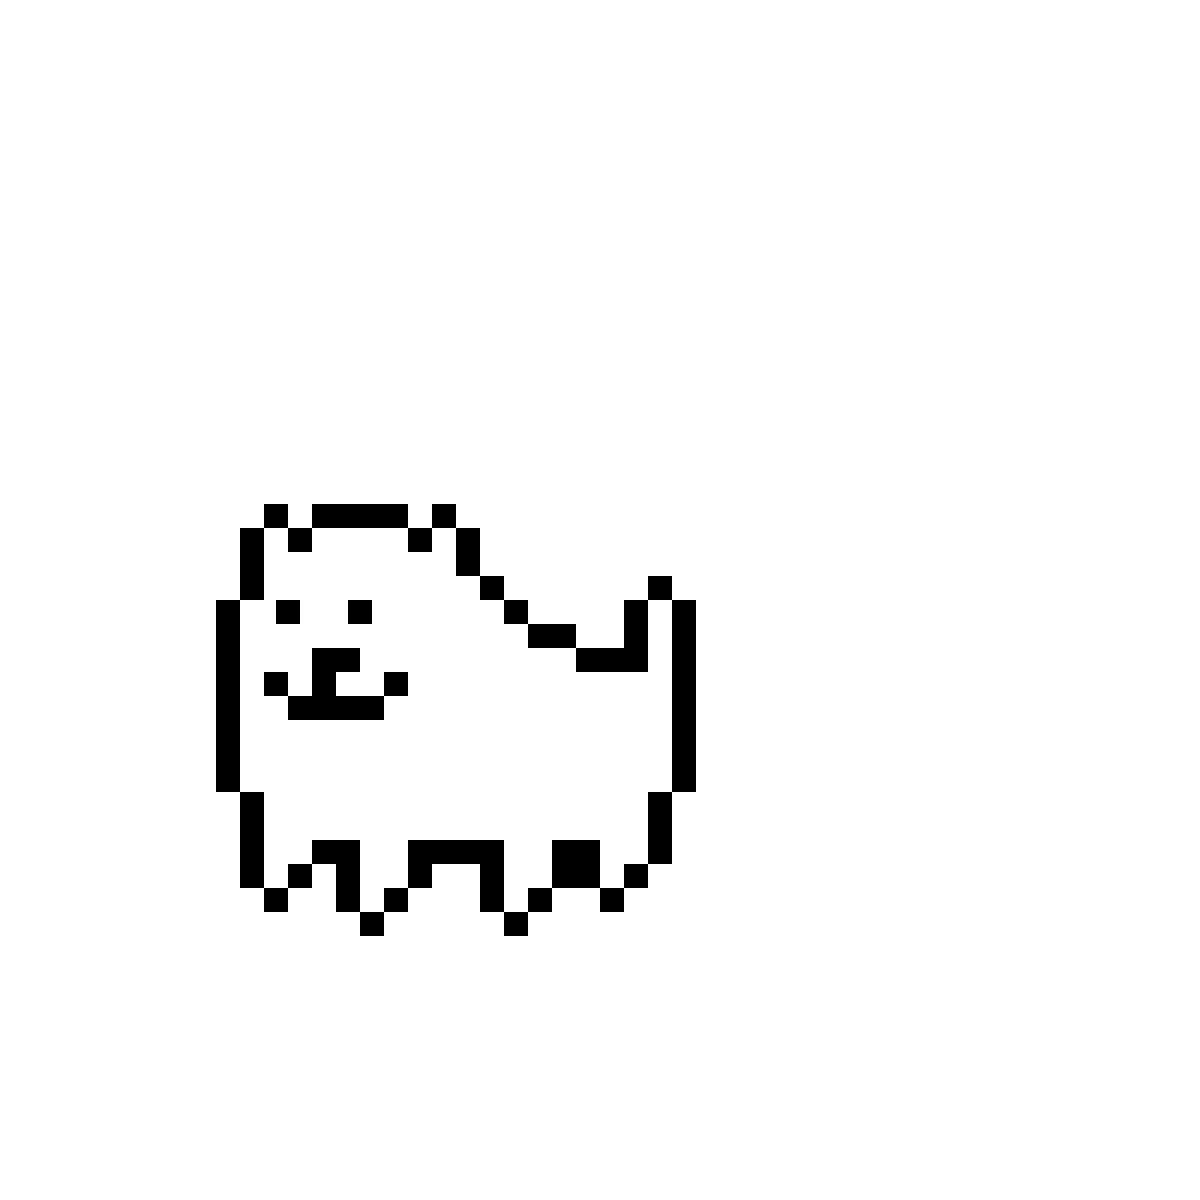 Annoying Dog by iThinkRamsHere